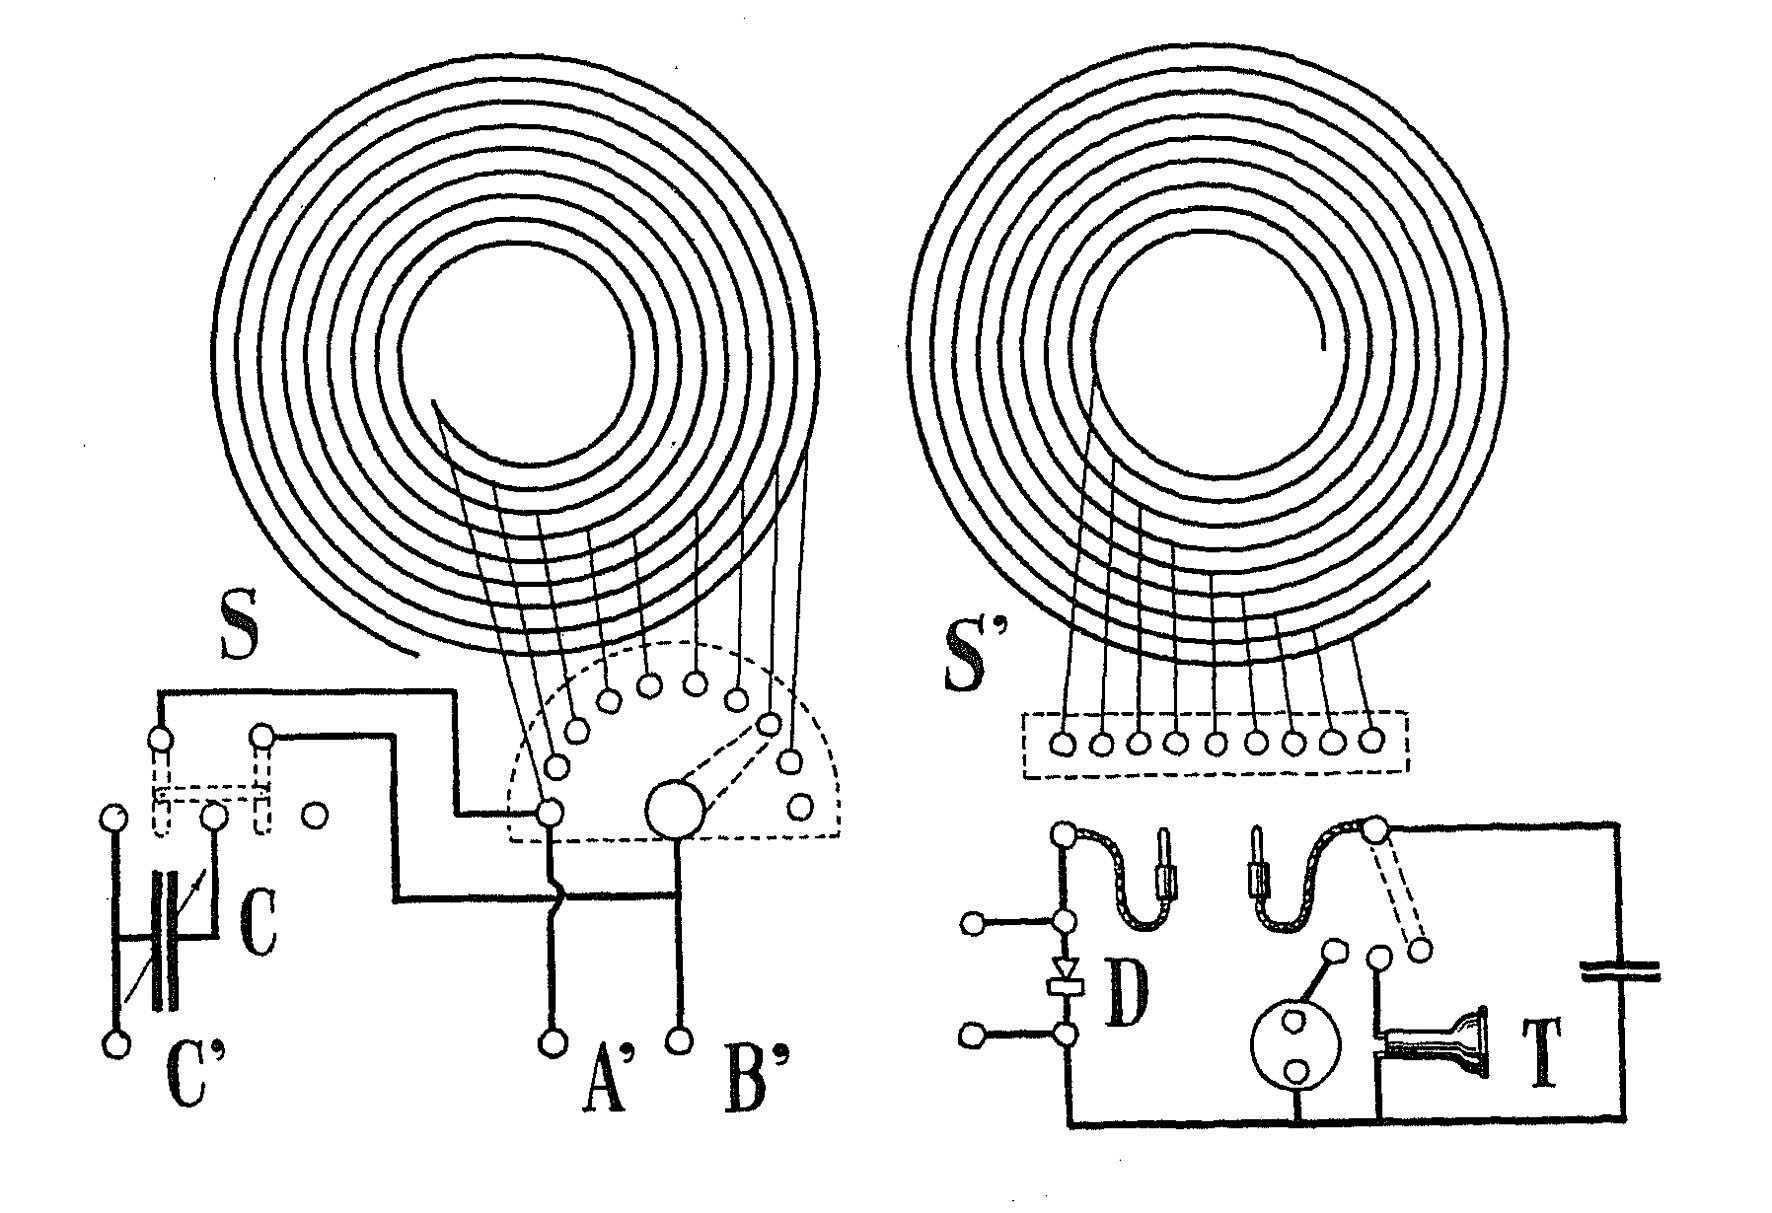 Crystal Radio Am Circuit Https Uploadwikimediaorg Wikipedia Commons 8 88 Receiver 1914